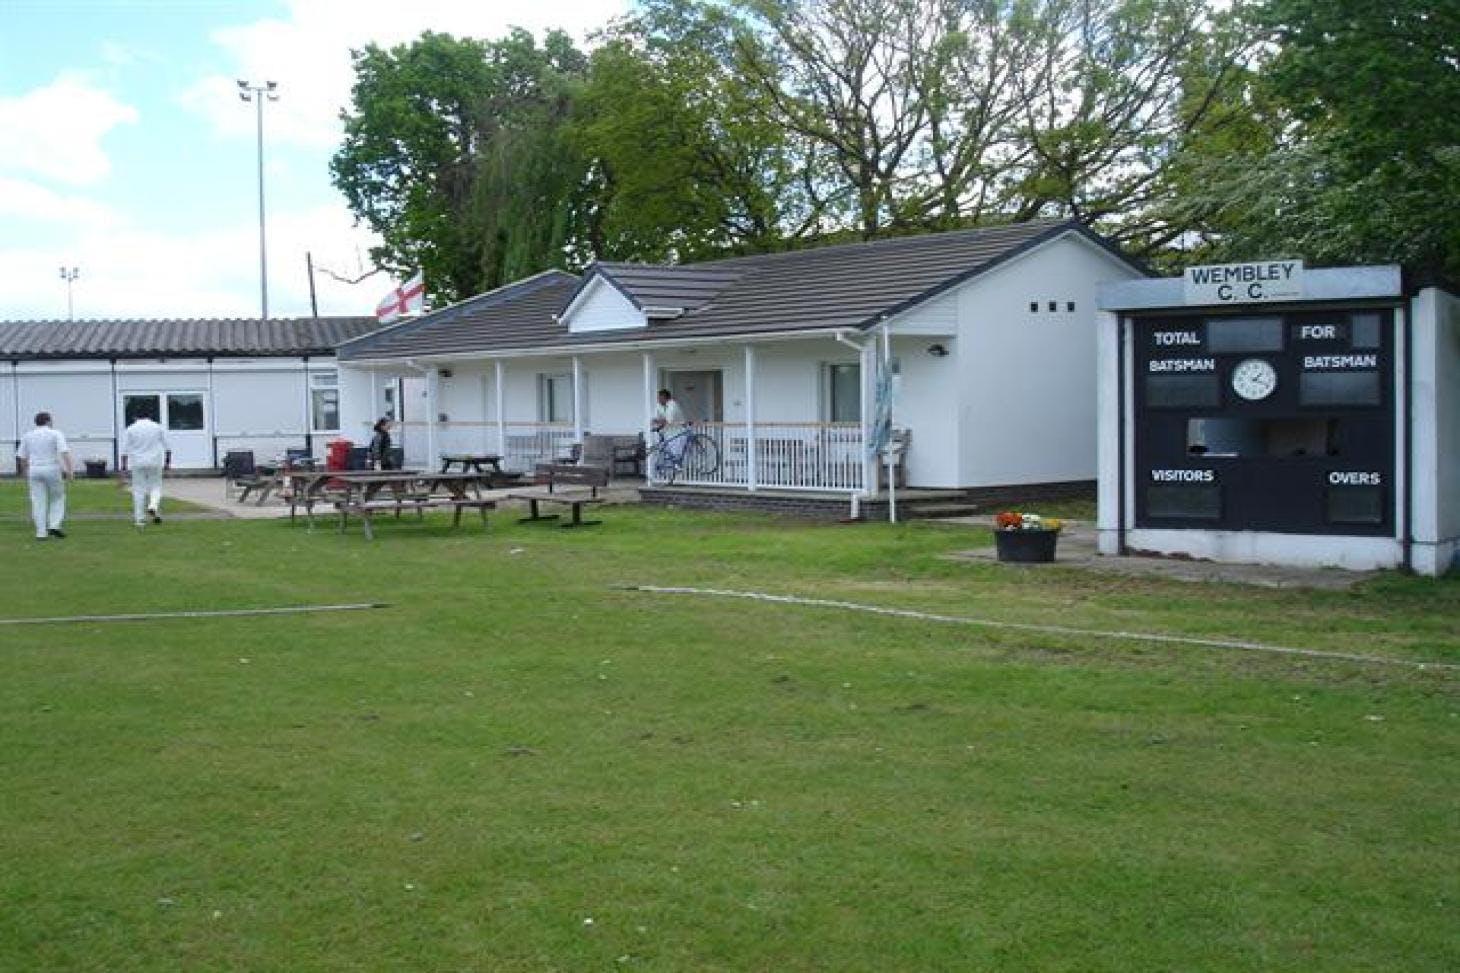 Wembley Cricket Club Full size | Grass cricket facilities